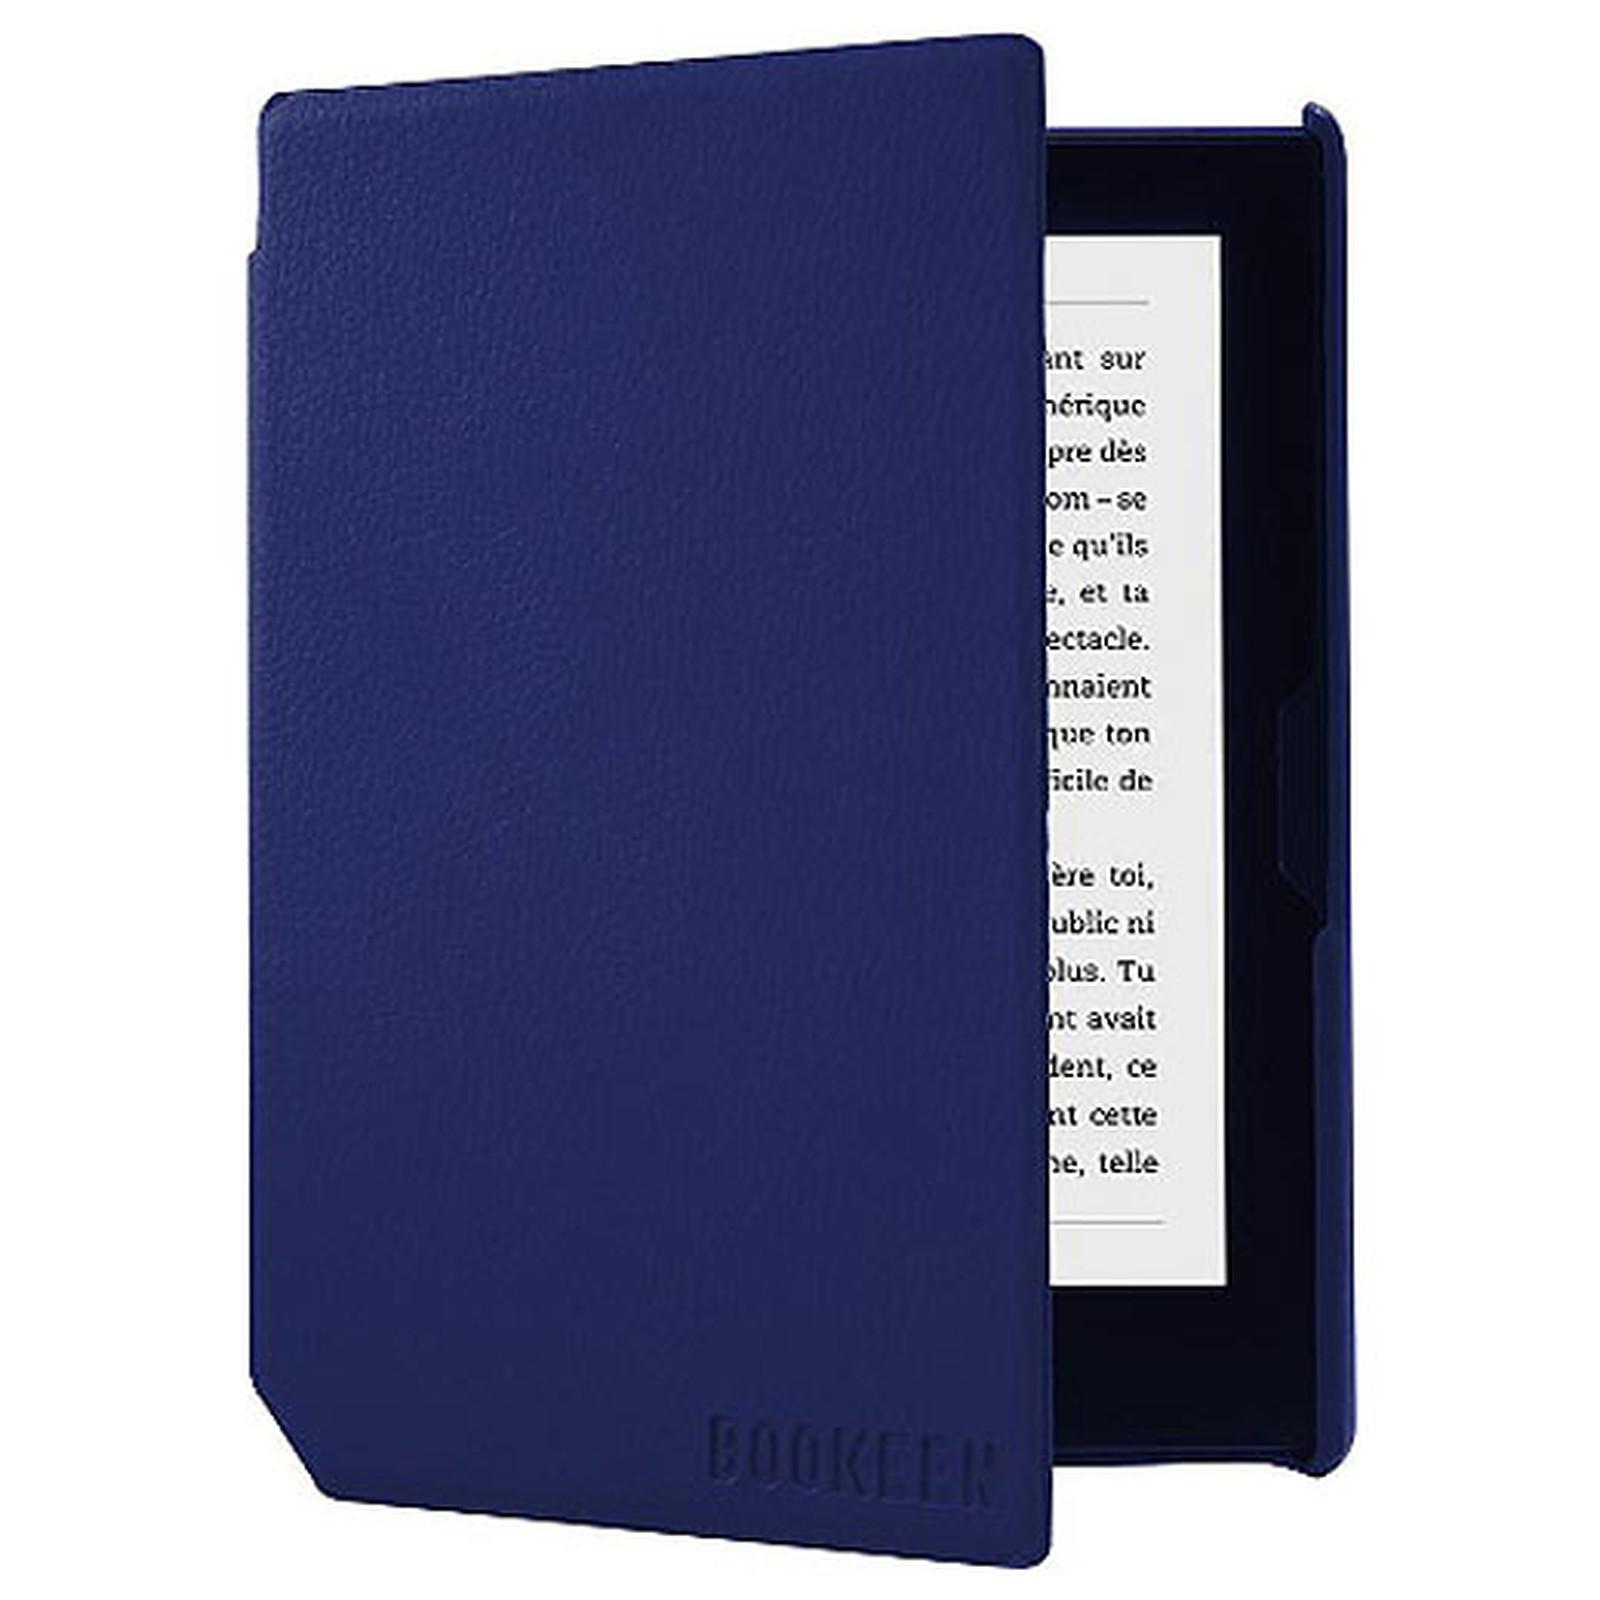 Bookeen Cybook Muse FrontLight 2 + Bookeen Cybook Cover Muse Bleu